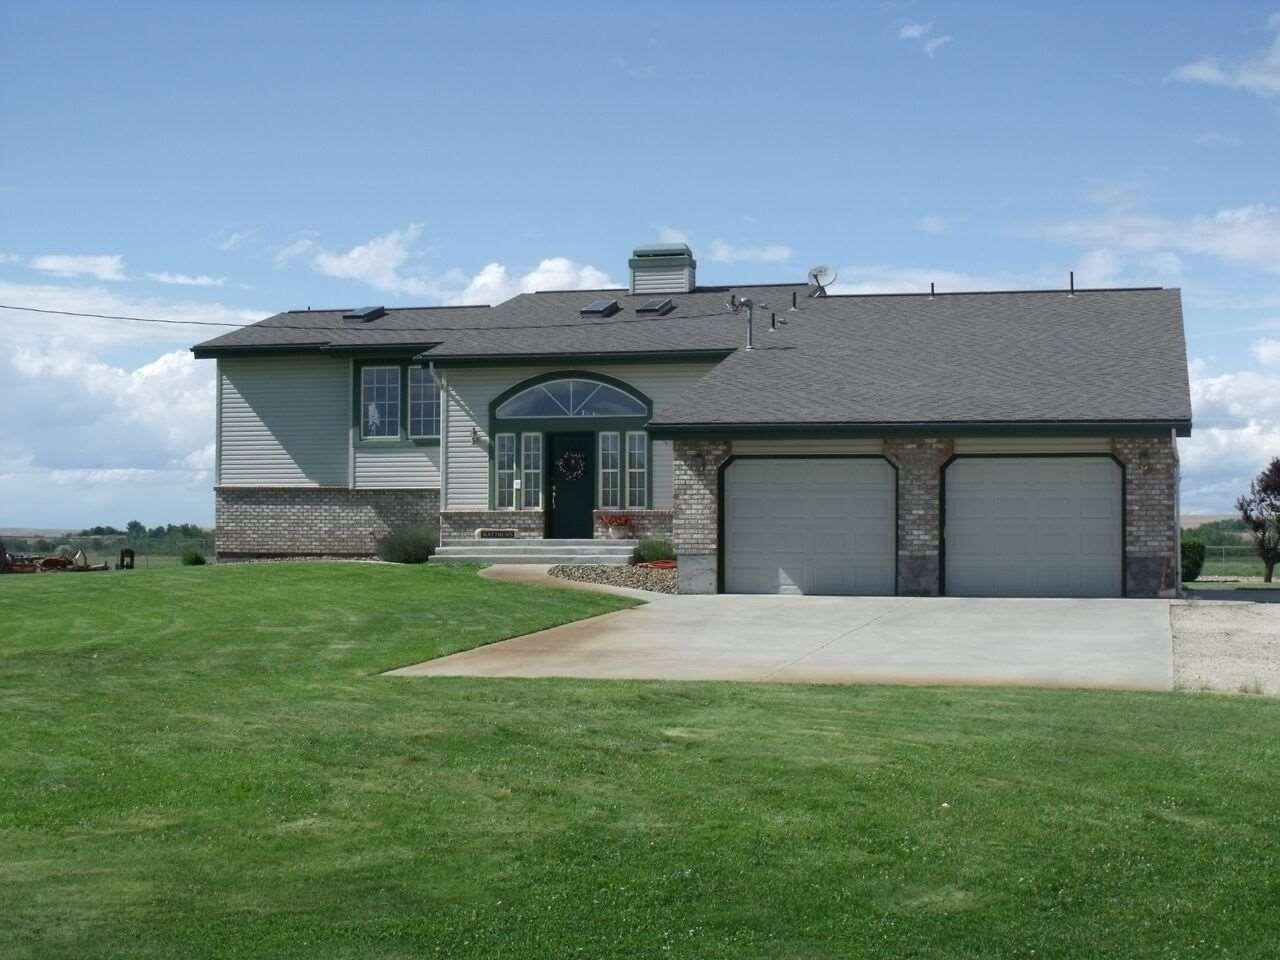 Single Family Home for Sale at 5595 Cascade Road Emmett, Idaho 83617